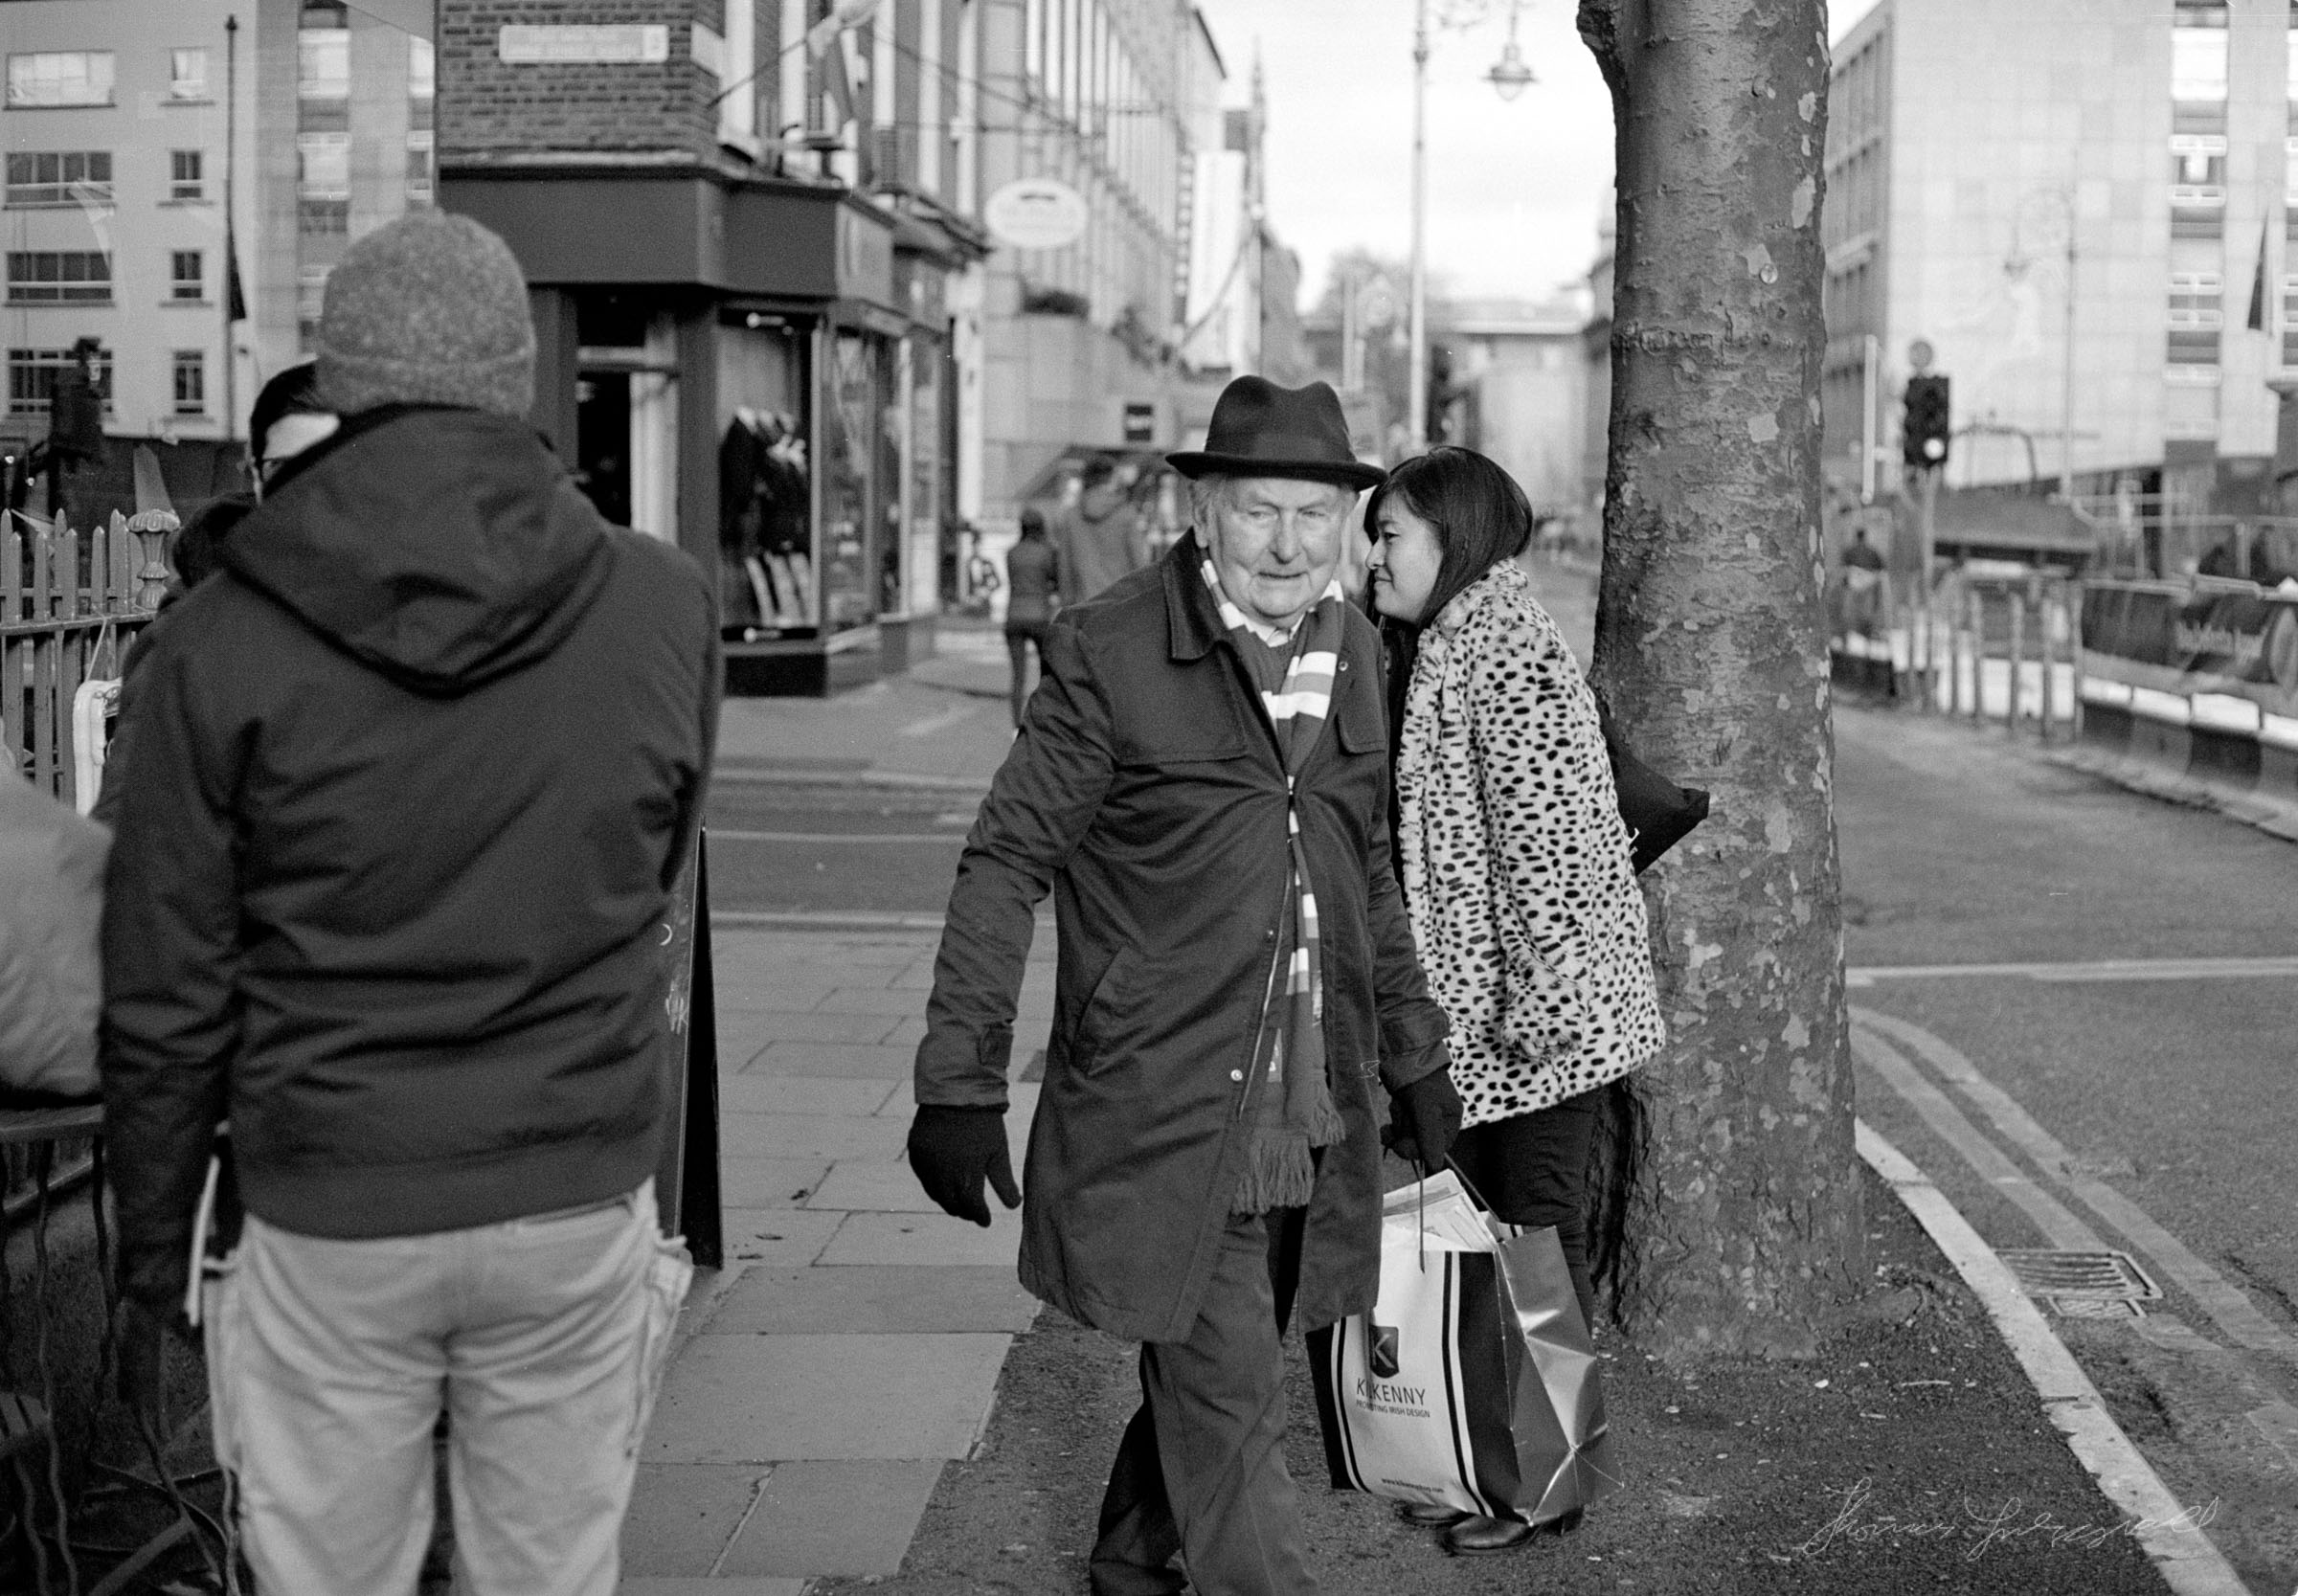 People on Dawson Street - Dublin on Film - The Streets of Dublin